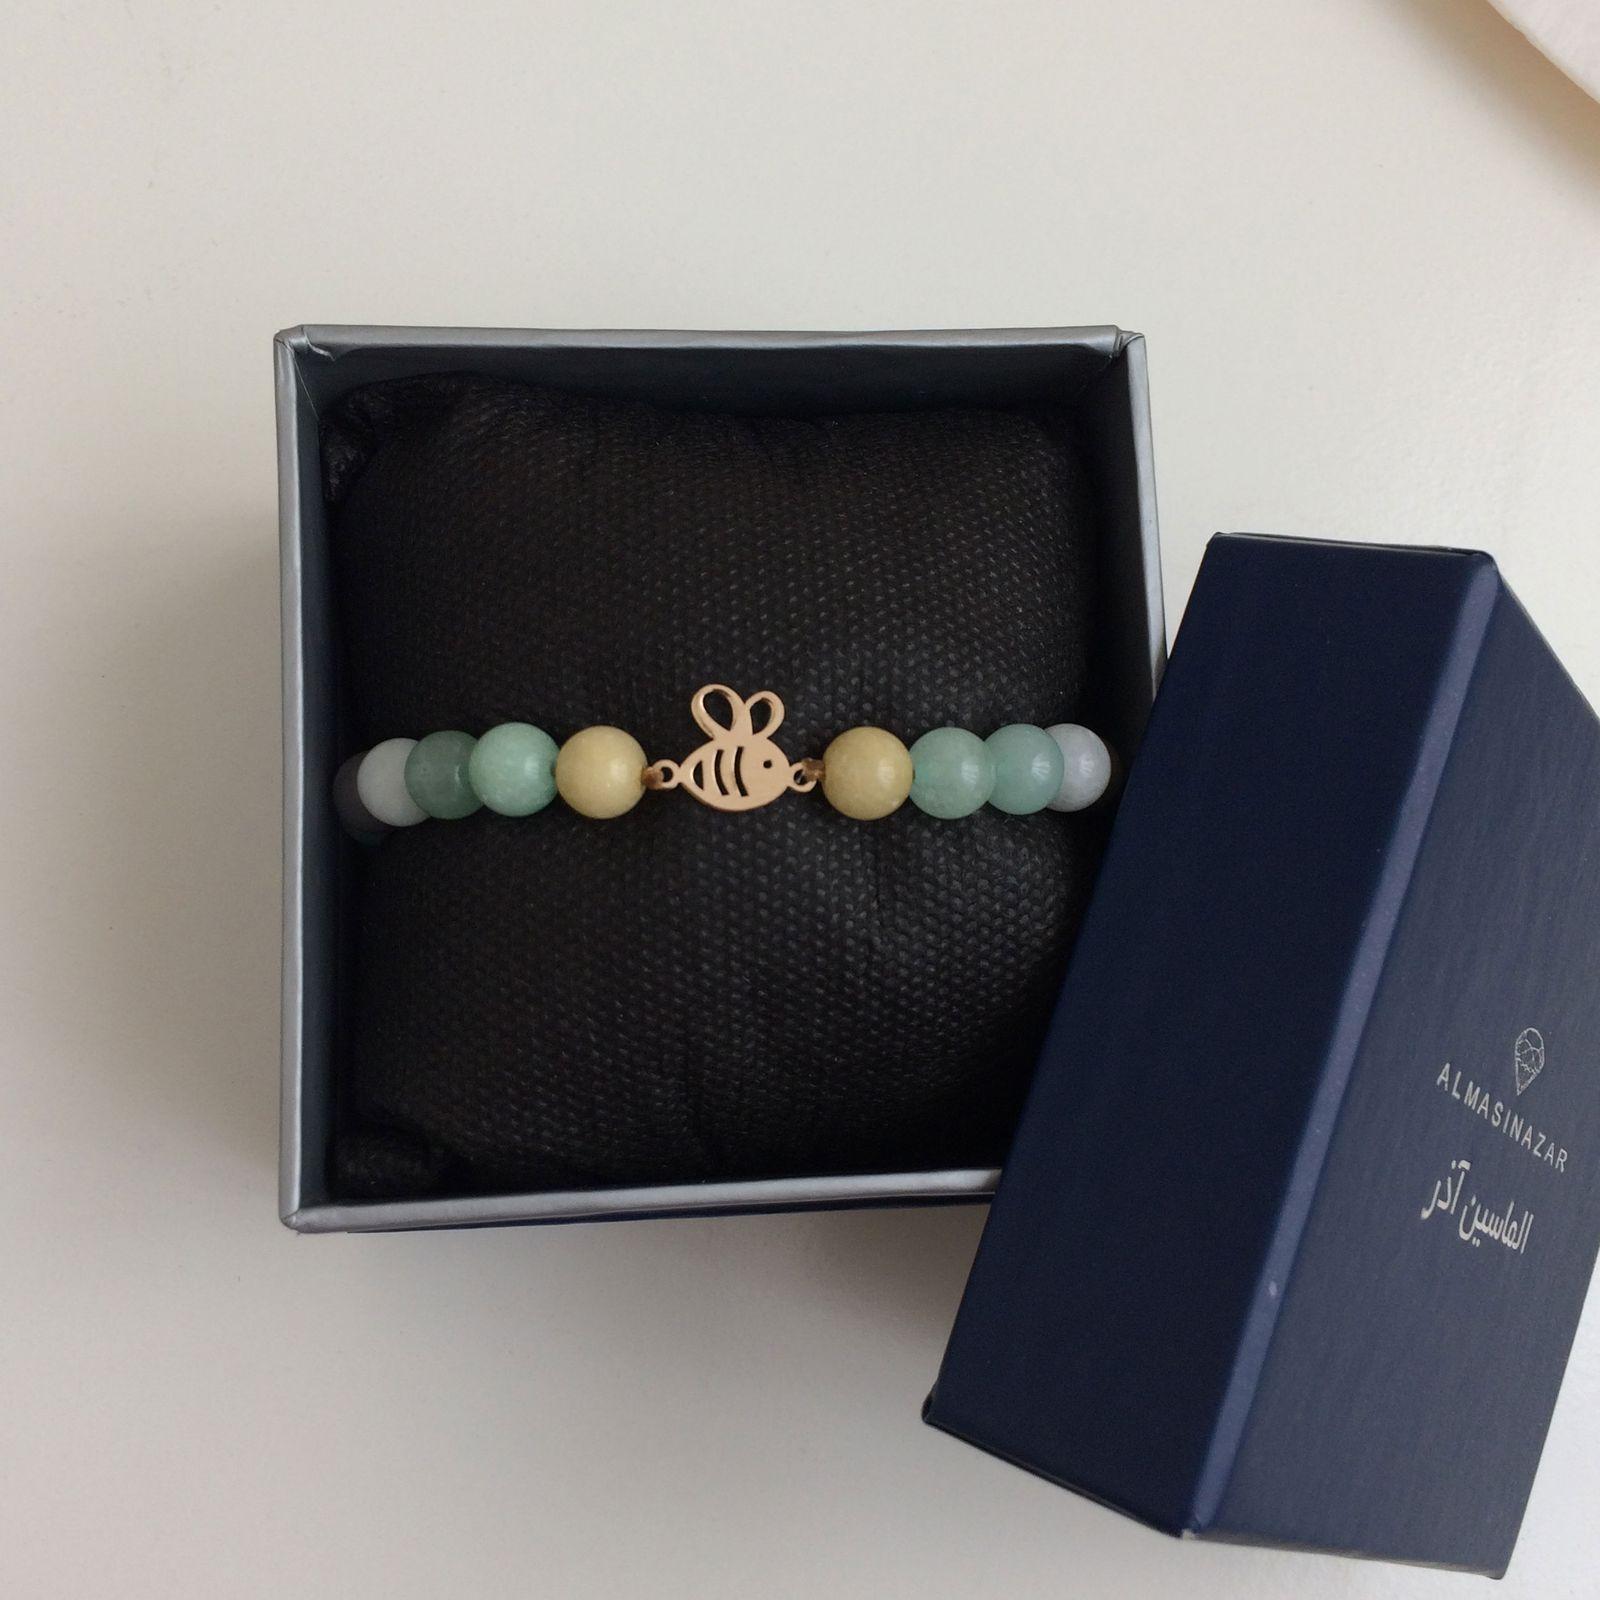 دستبند طلا 18 عیار زنانه الماسین آذر کد ZANBUR01 -  - 3